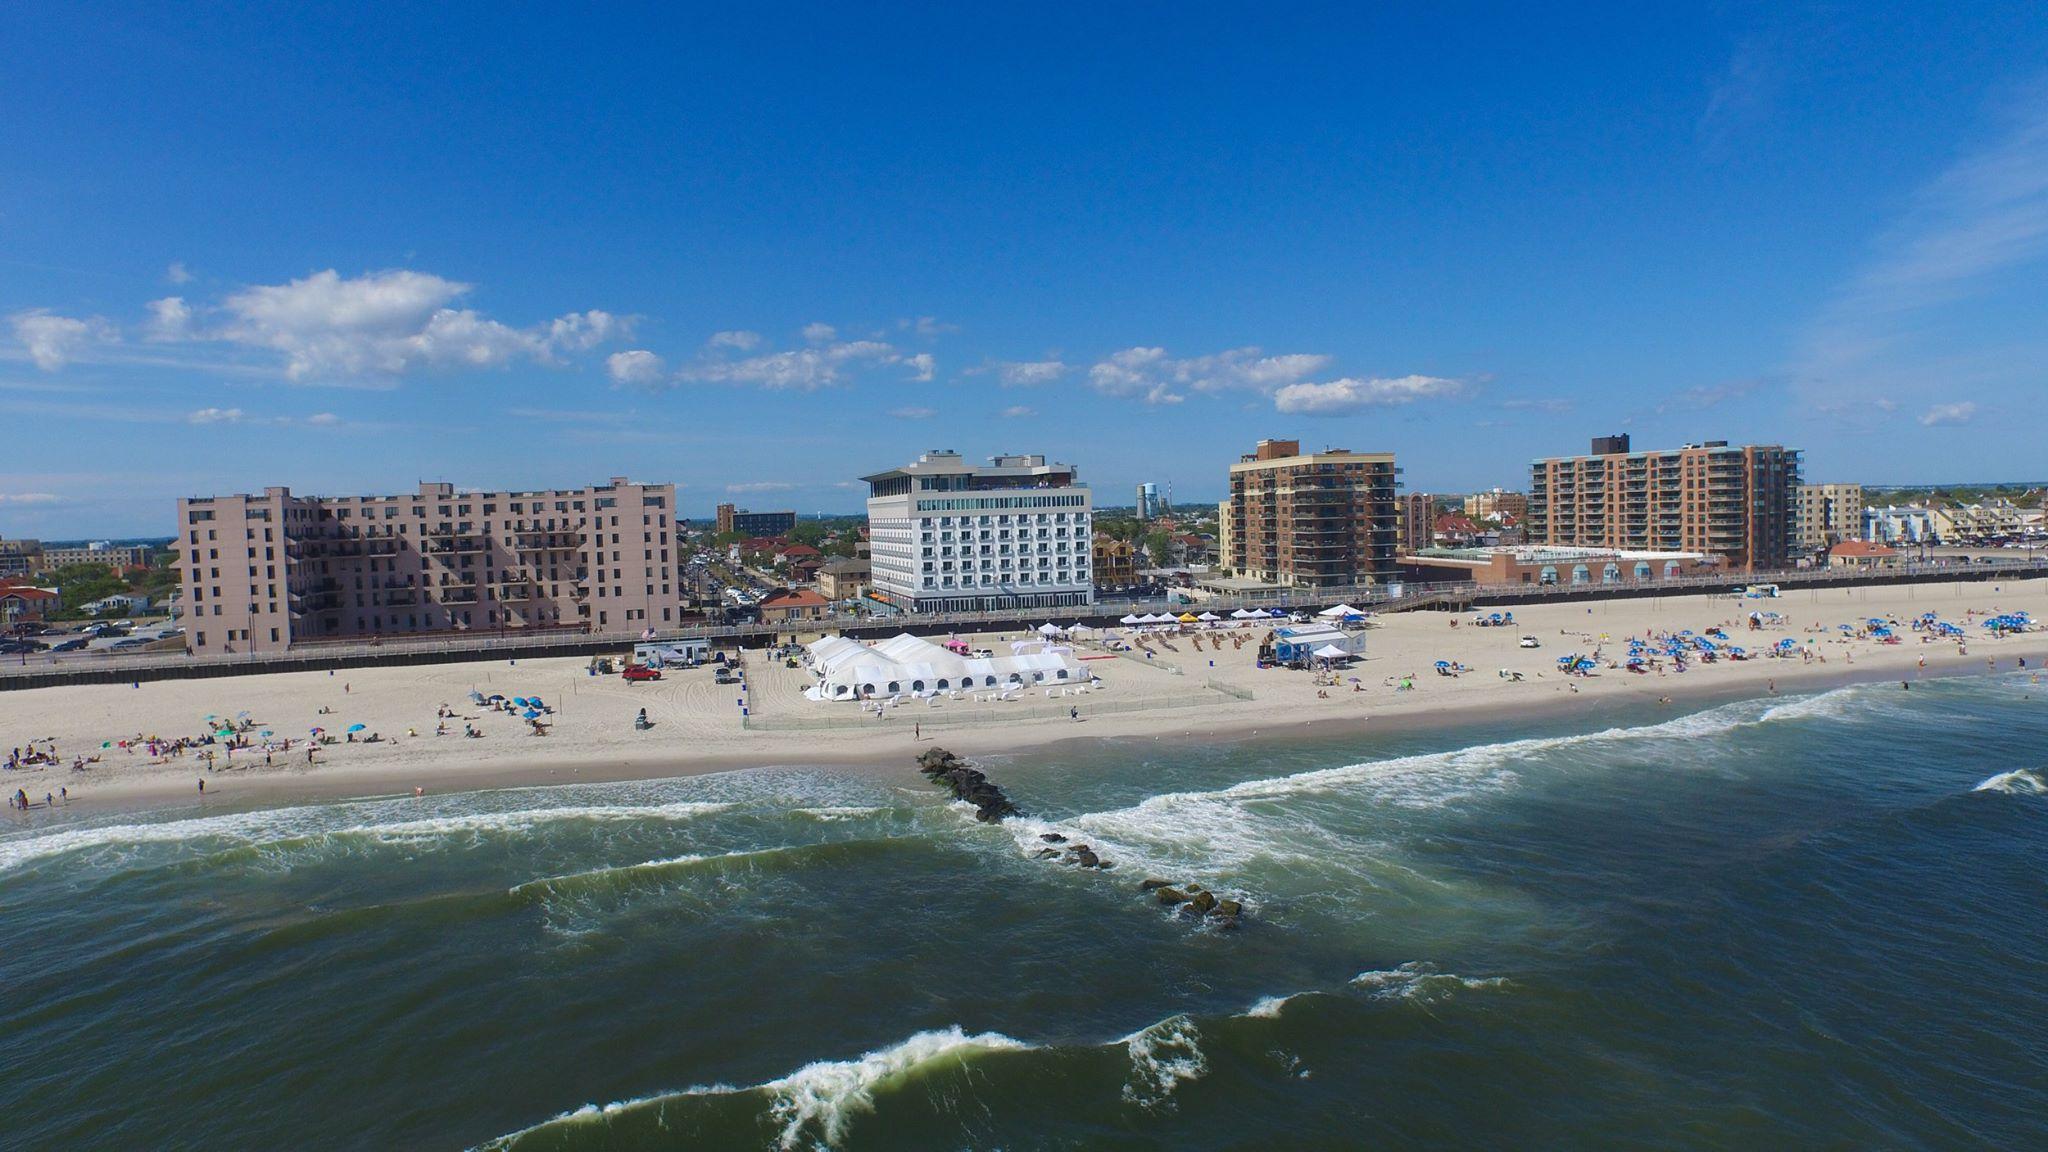 OVERHEAD SHOT OF TASTE ON THE BEACH & SHORTS ON THE BEACH IN 2015